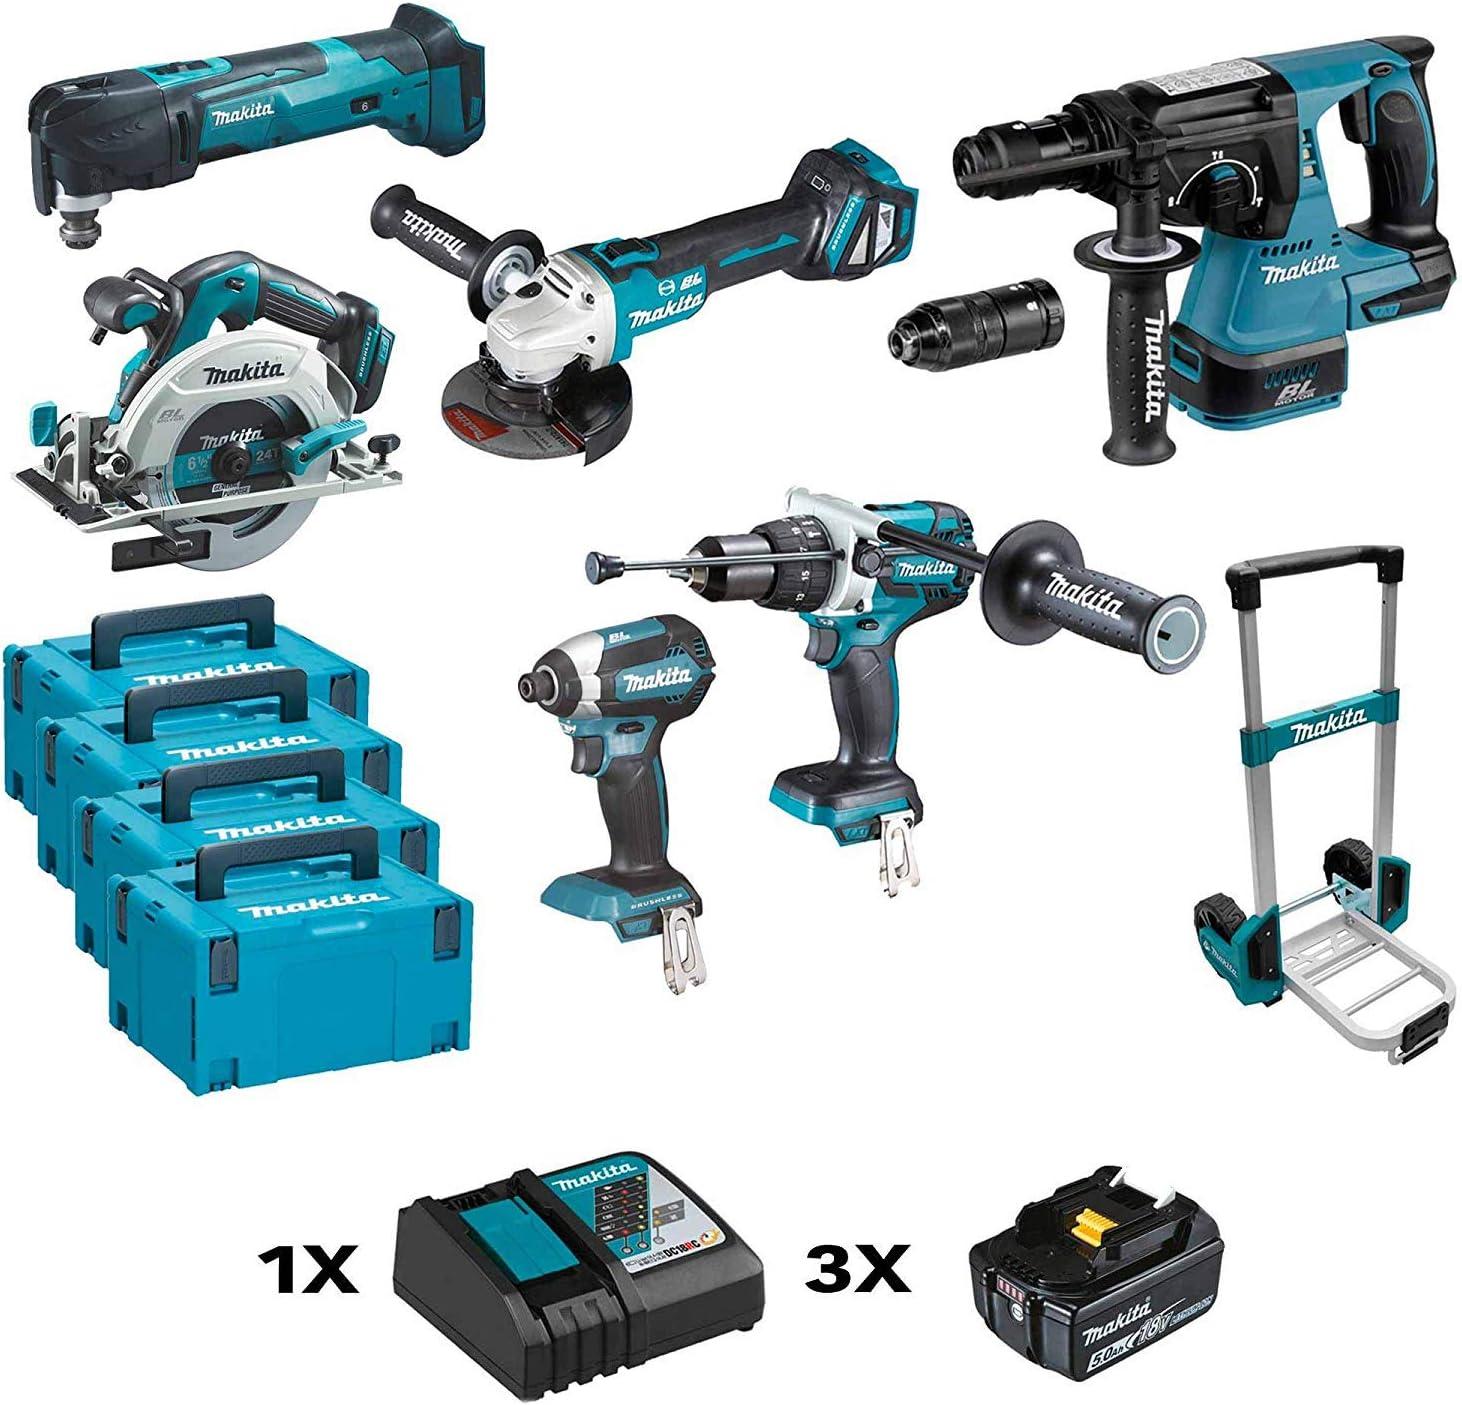 Makita DLX6085TJ Kit Combo: Amazon.es: Bricolaje y herramientas